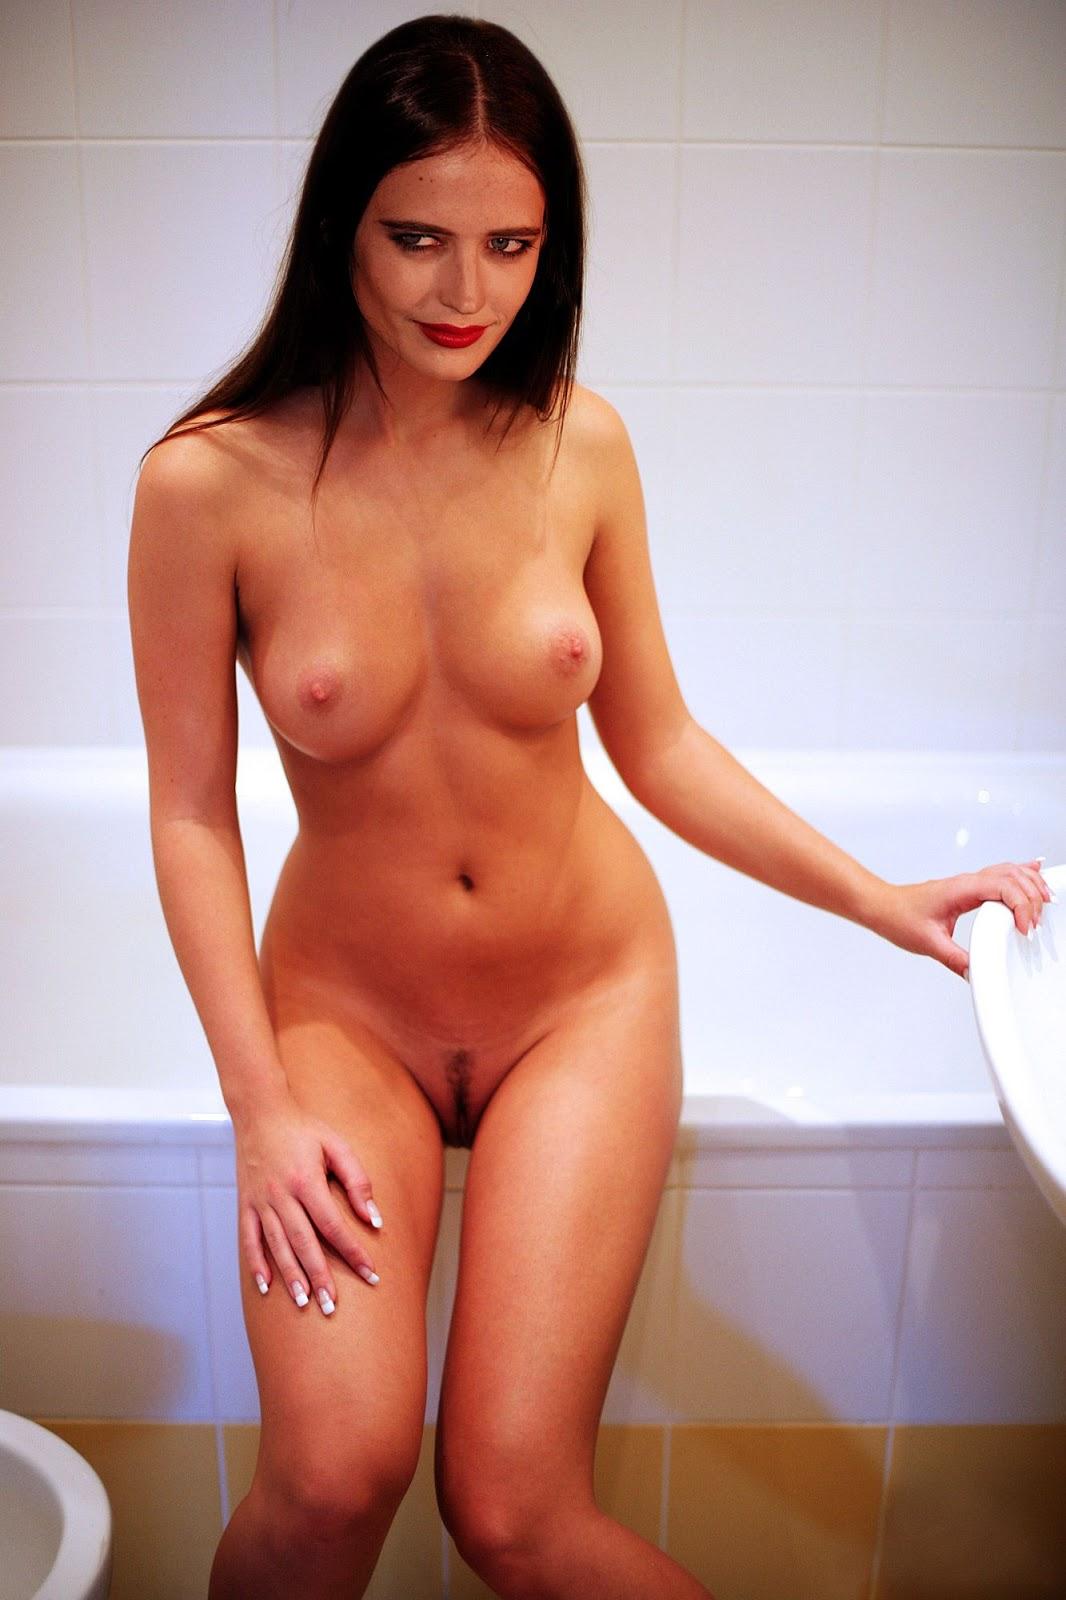 Eva green fake nude pics — photo 4